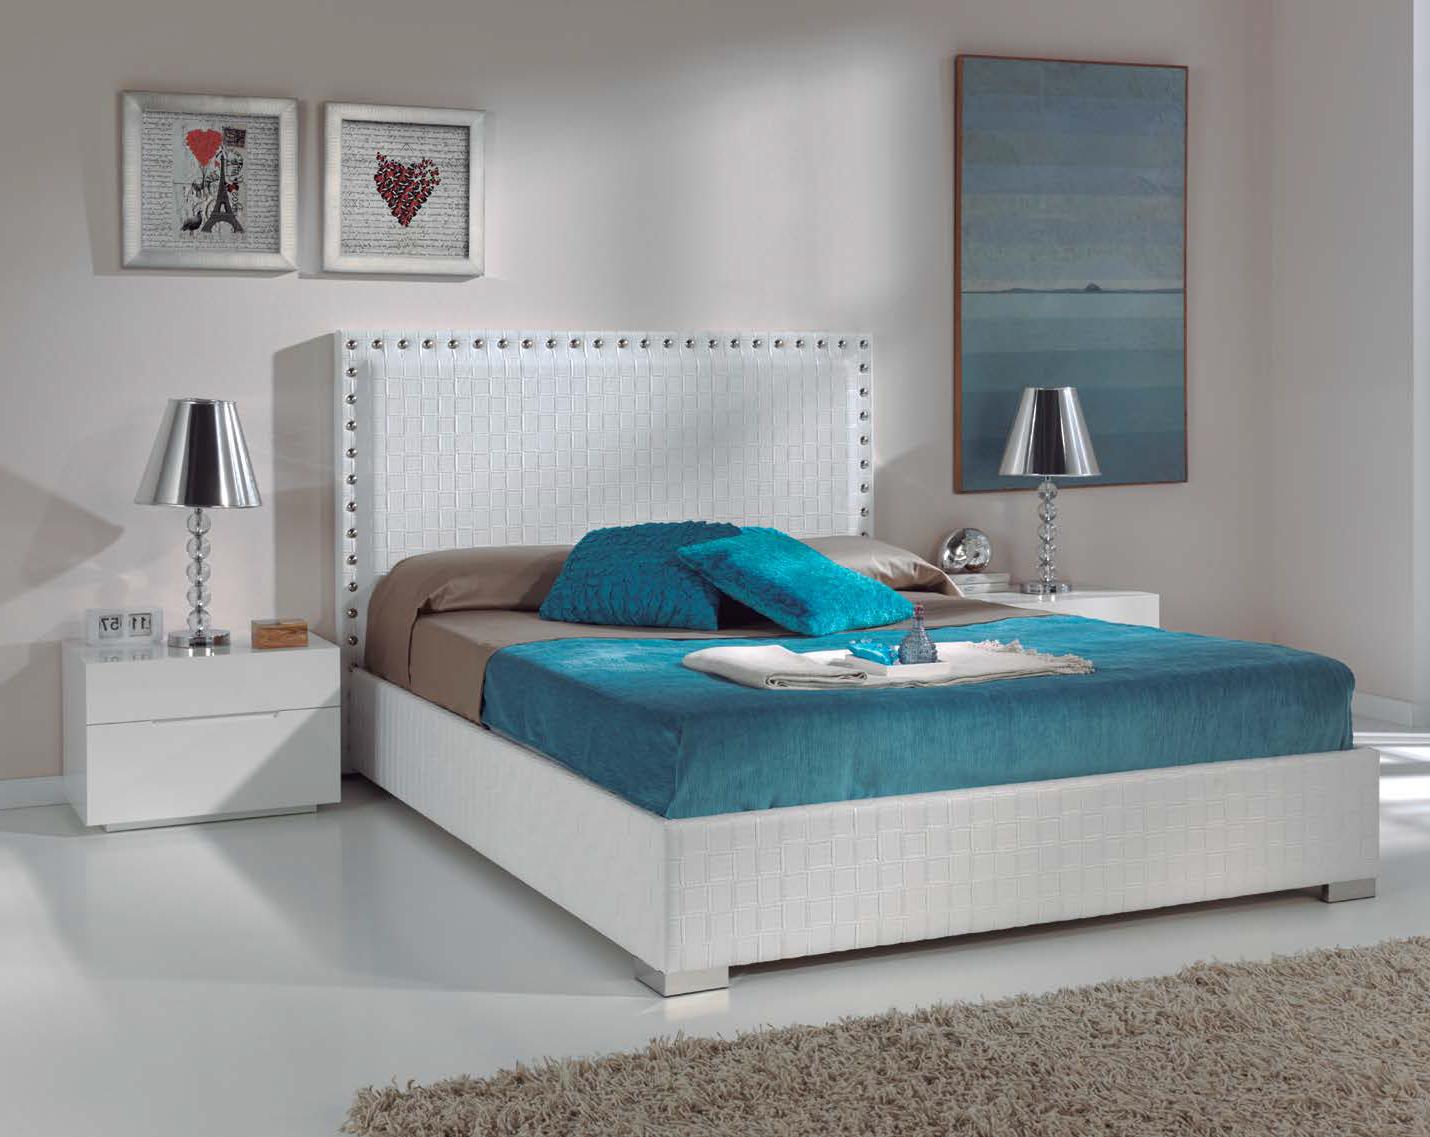 Cama tapizada malta muebles d azmuebles d az for Cama tapizada